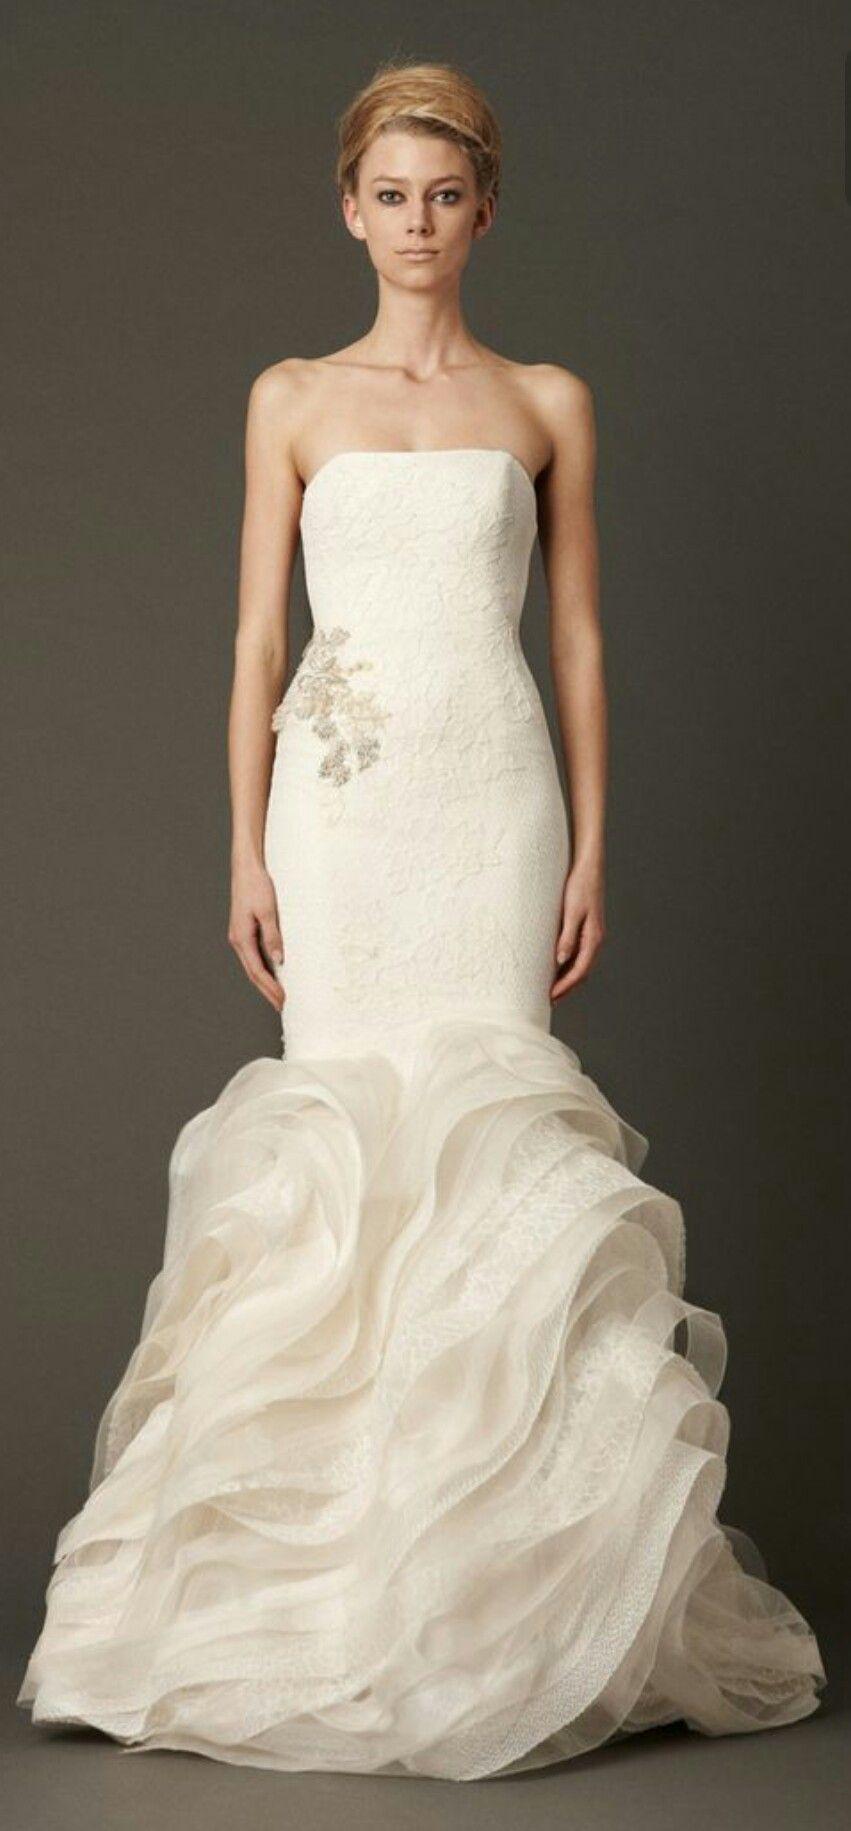 Vera Wang Lindsey Mermaid Silhouette Wedding Gown Wedding Dresses Vera Wang Vera Wang Bridal Designer Wedding Dresses [ 1831 x 851 Pixel ]